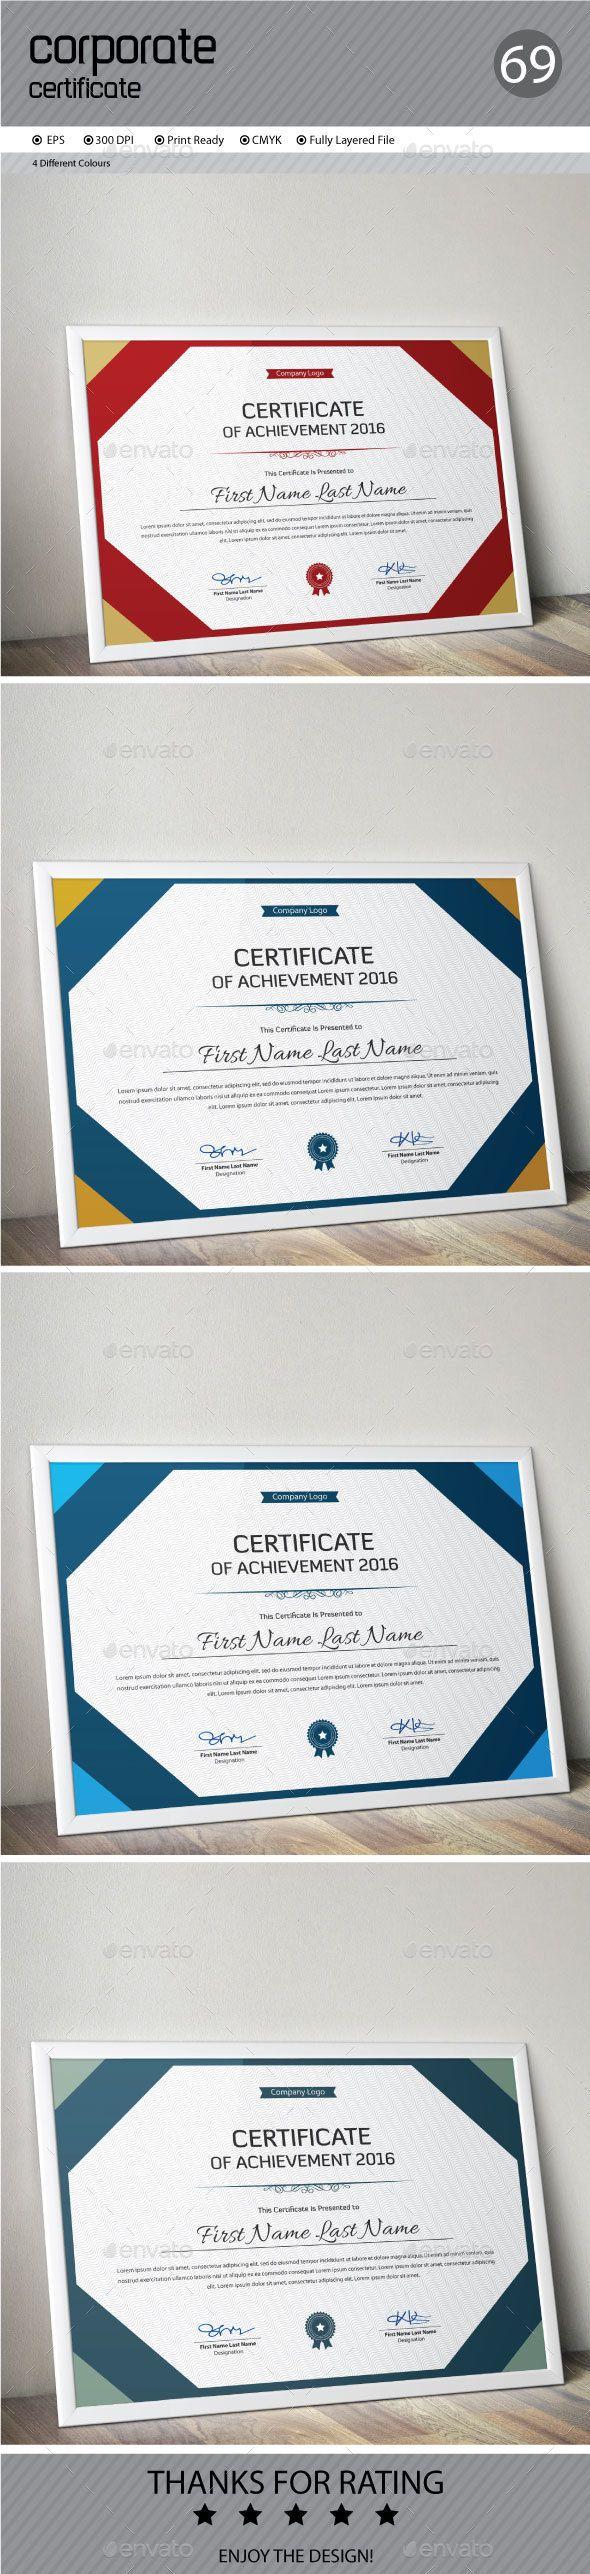 Certificate Template Vector EPS. Download here: http://graphicriver.net/item/certificate/15380322?ref=ksioks